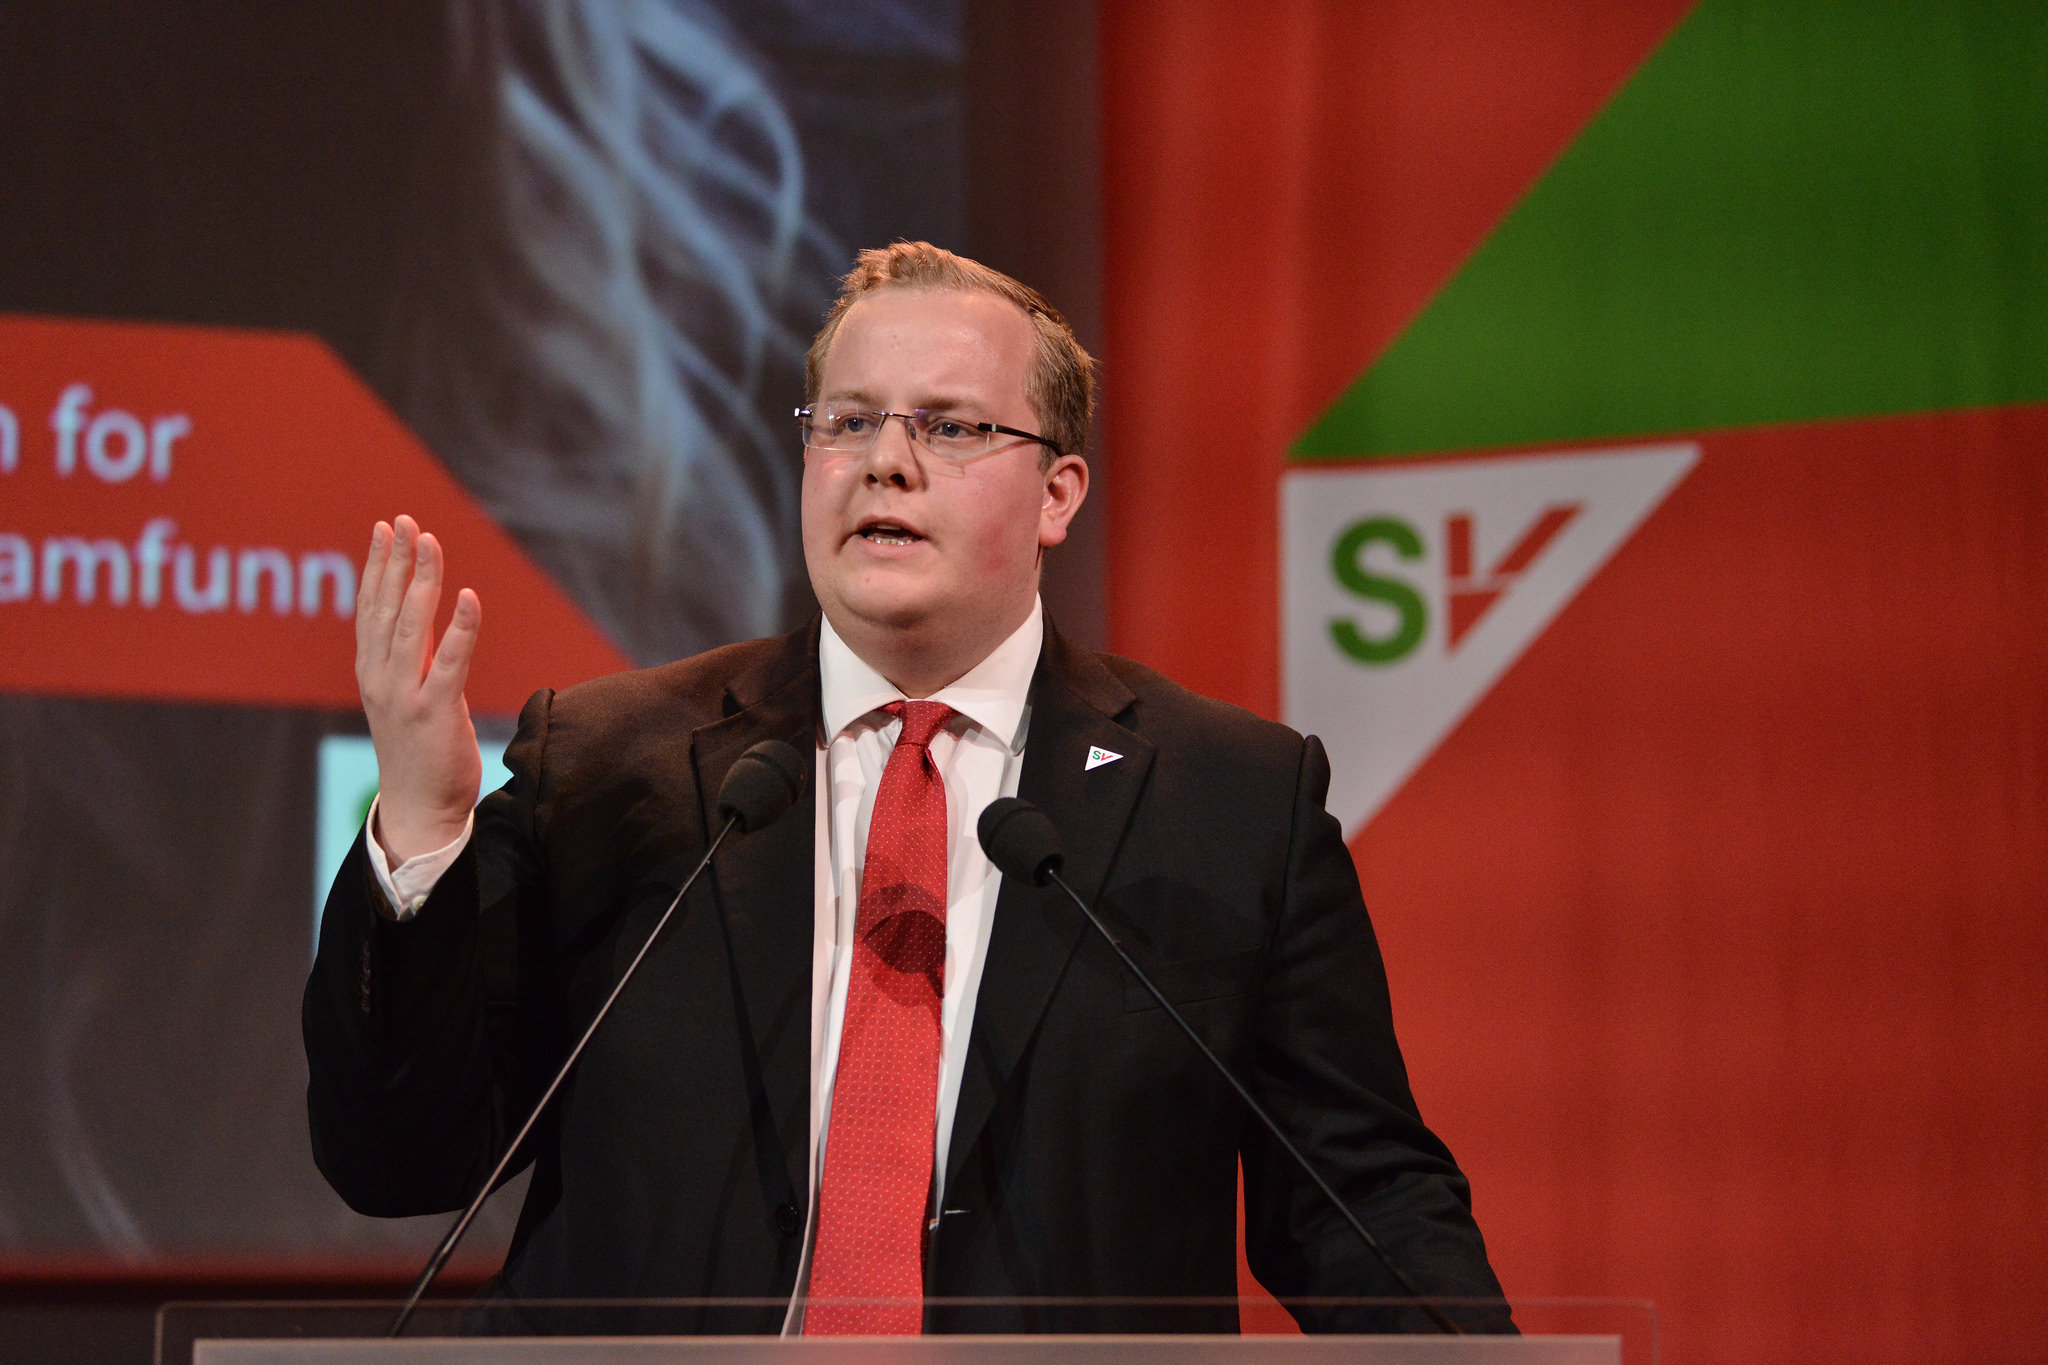 SV-politikar Eirik Faret Sakariassen håpar å styrke nynorsken. Foto: Marius Nyheim Kristoffersen/SV